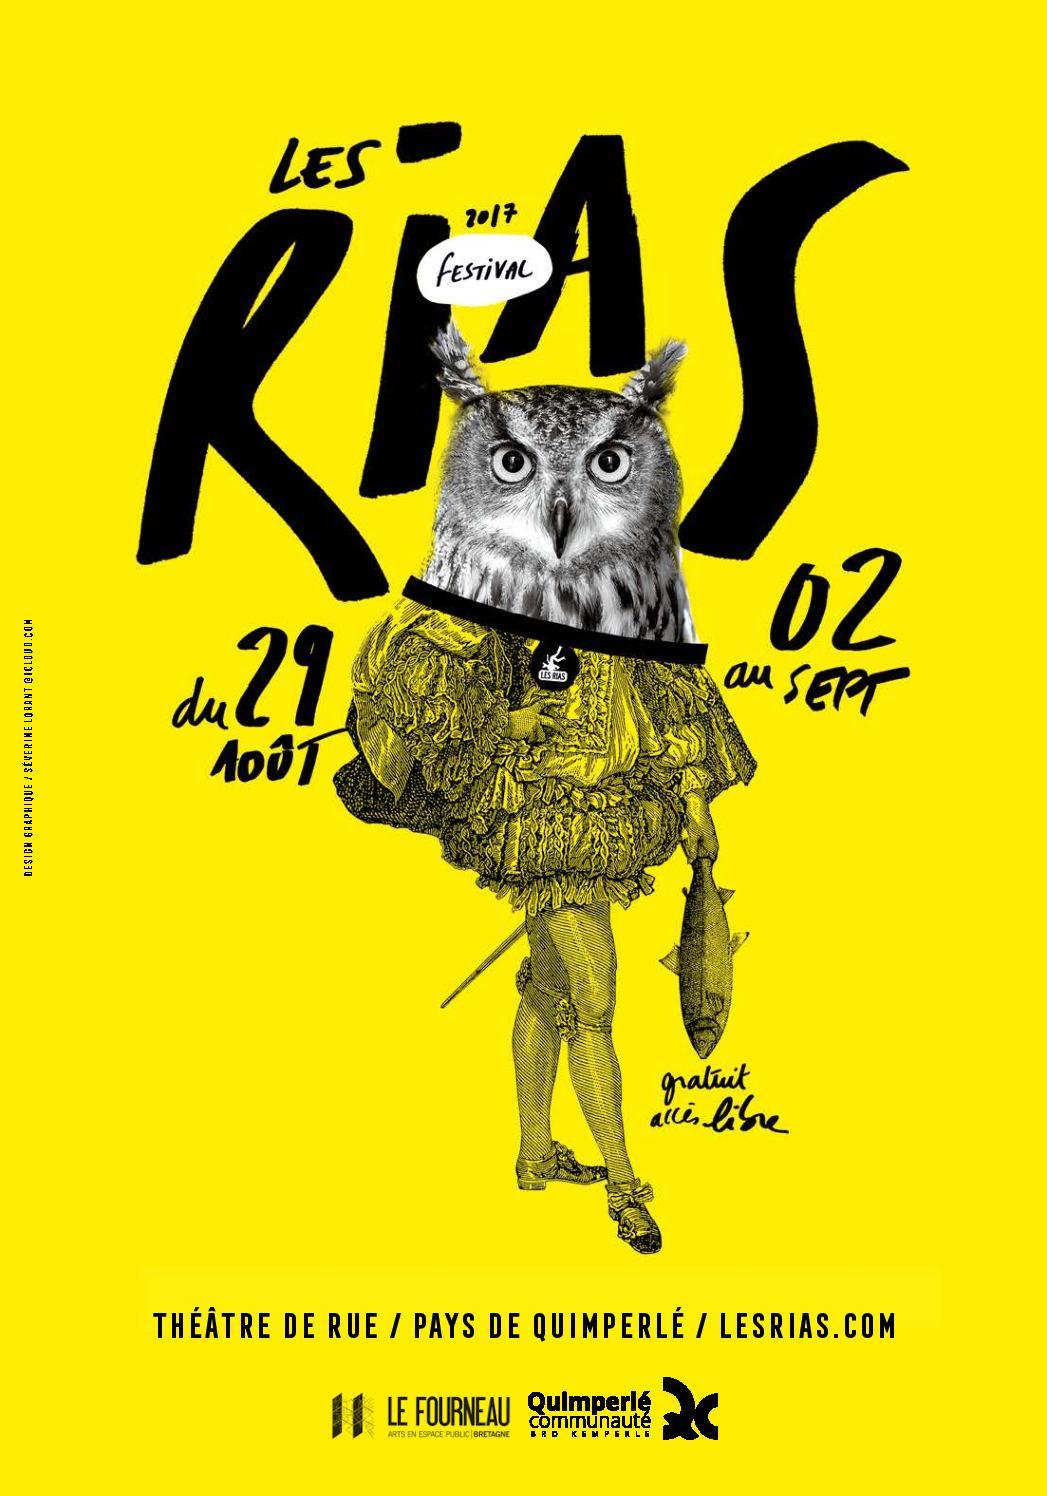 Calaméo Festival 2017Le Des Programme Rias Yfgv7by6